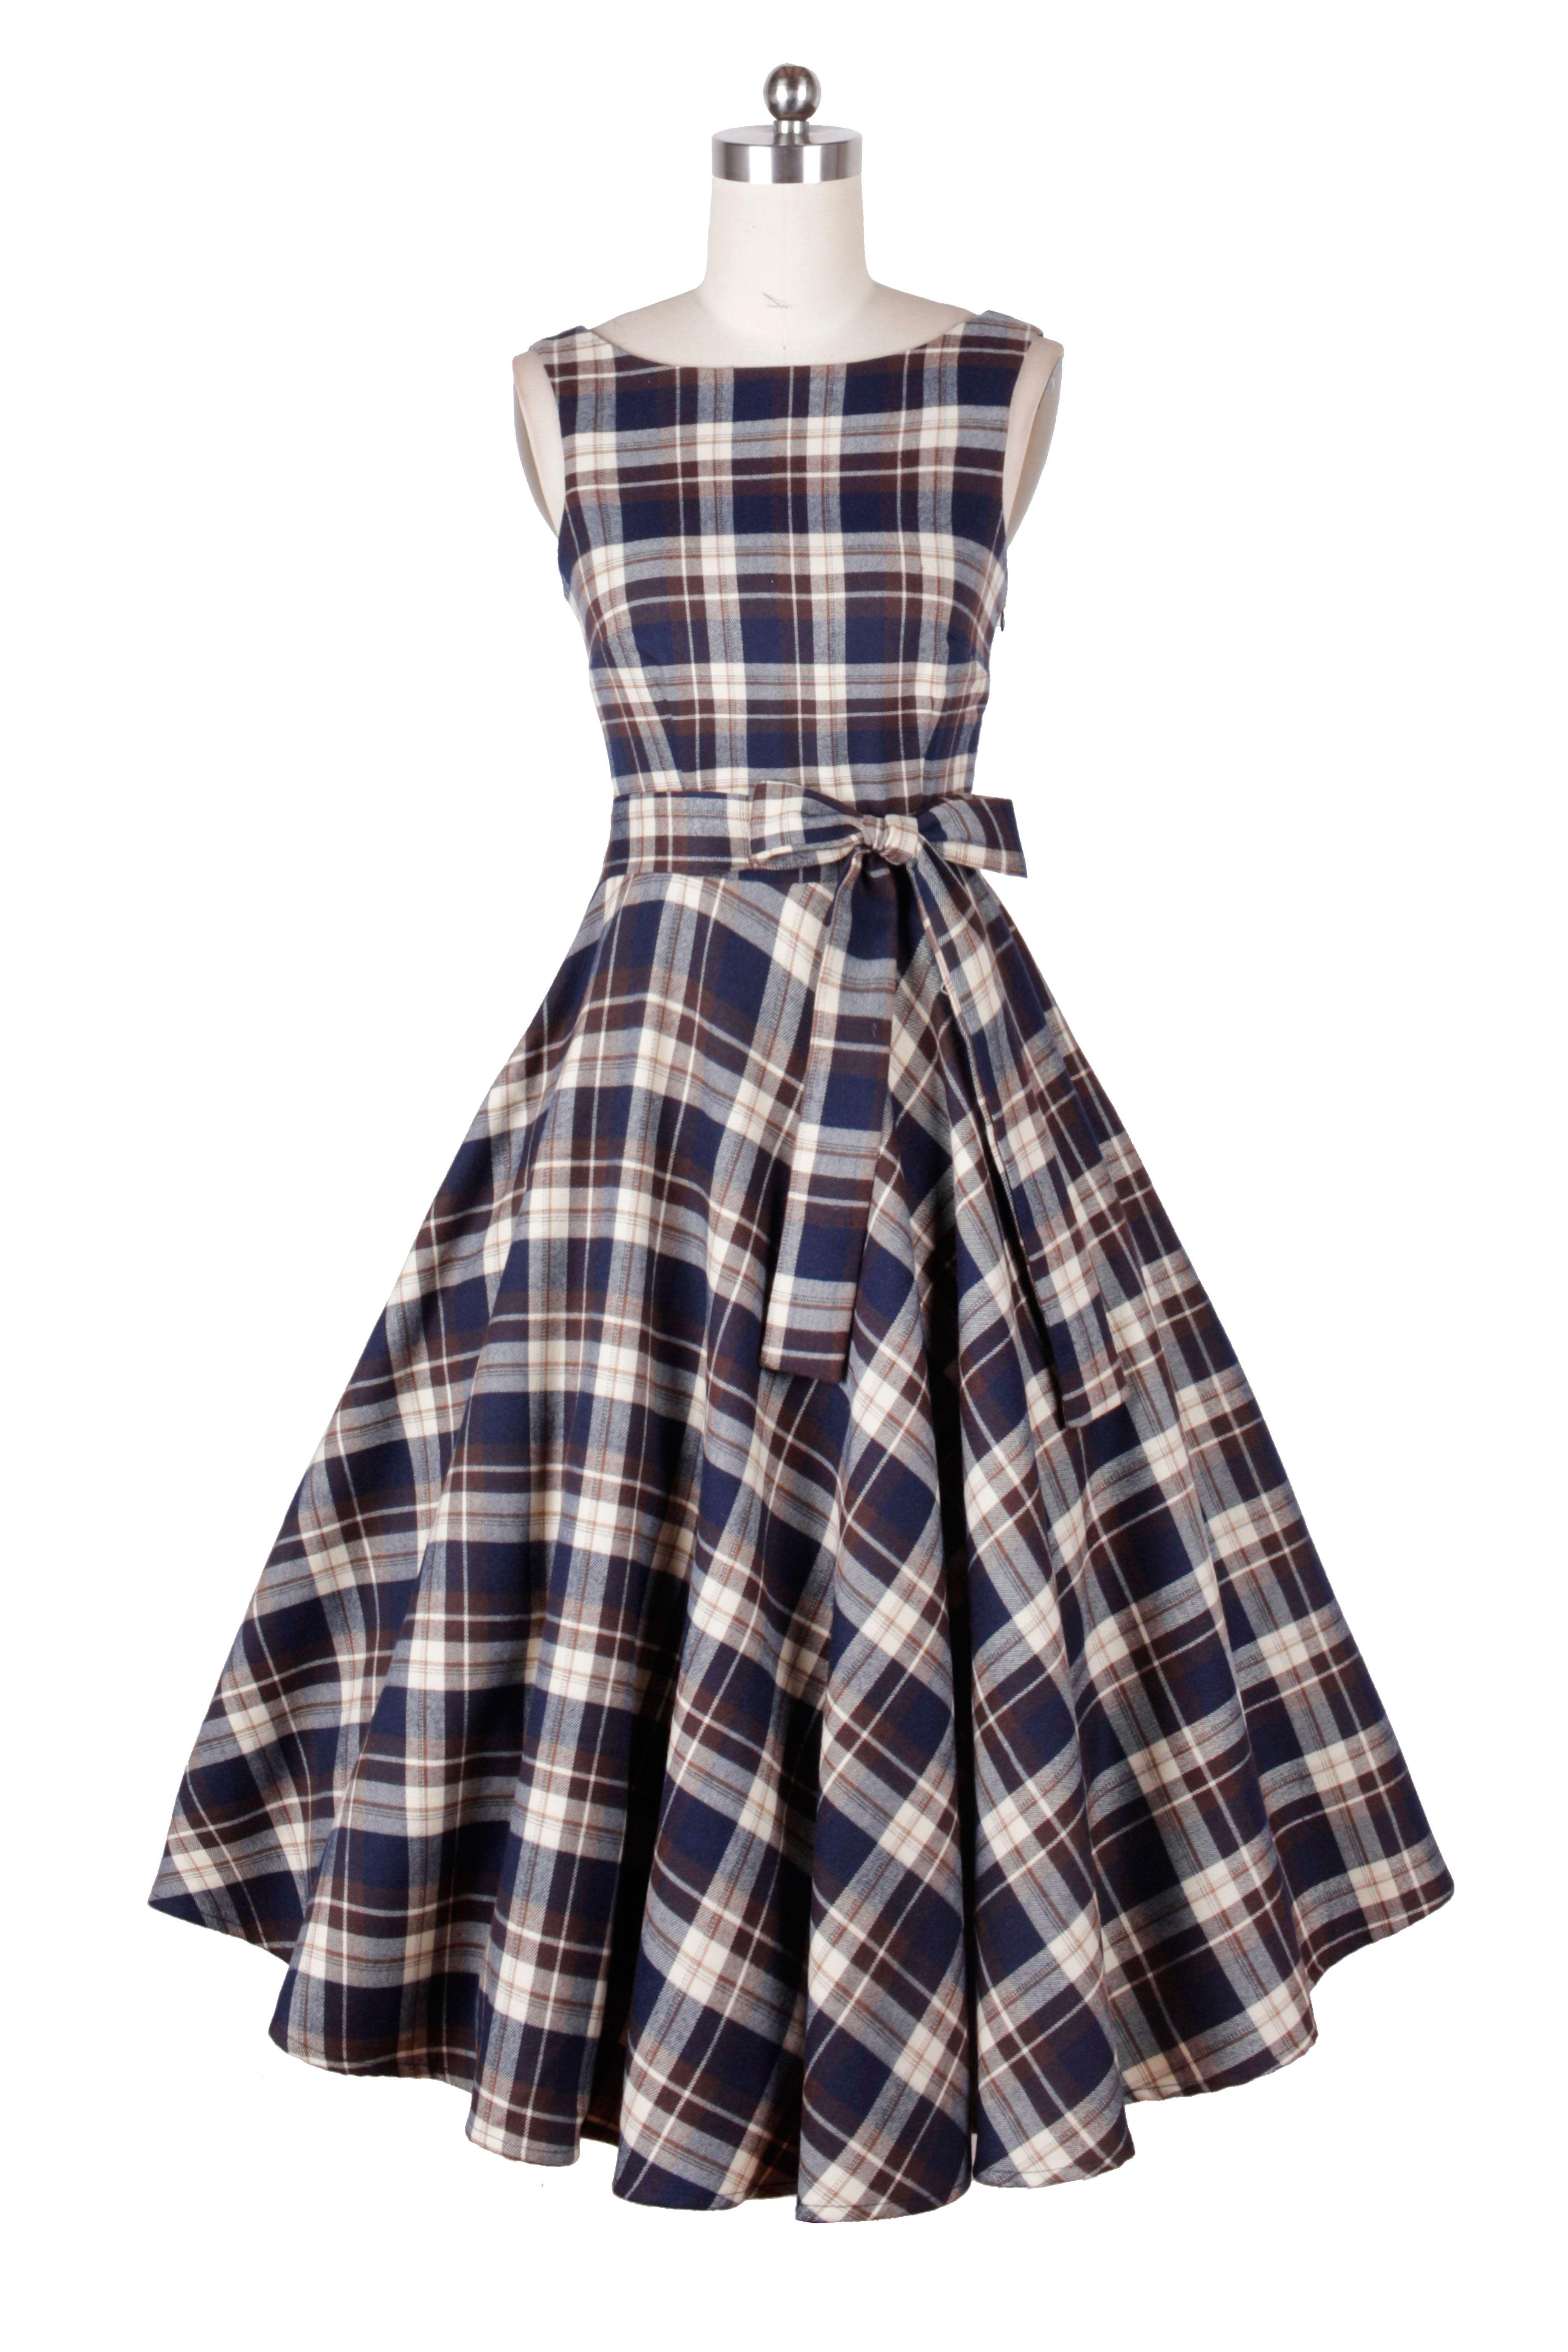 1410171- 1950s pinup vintage rockabilly hepburn tartan dress | Style ...